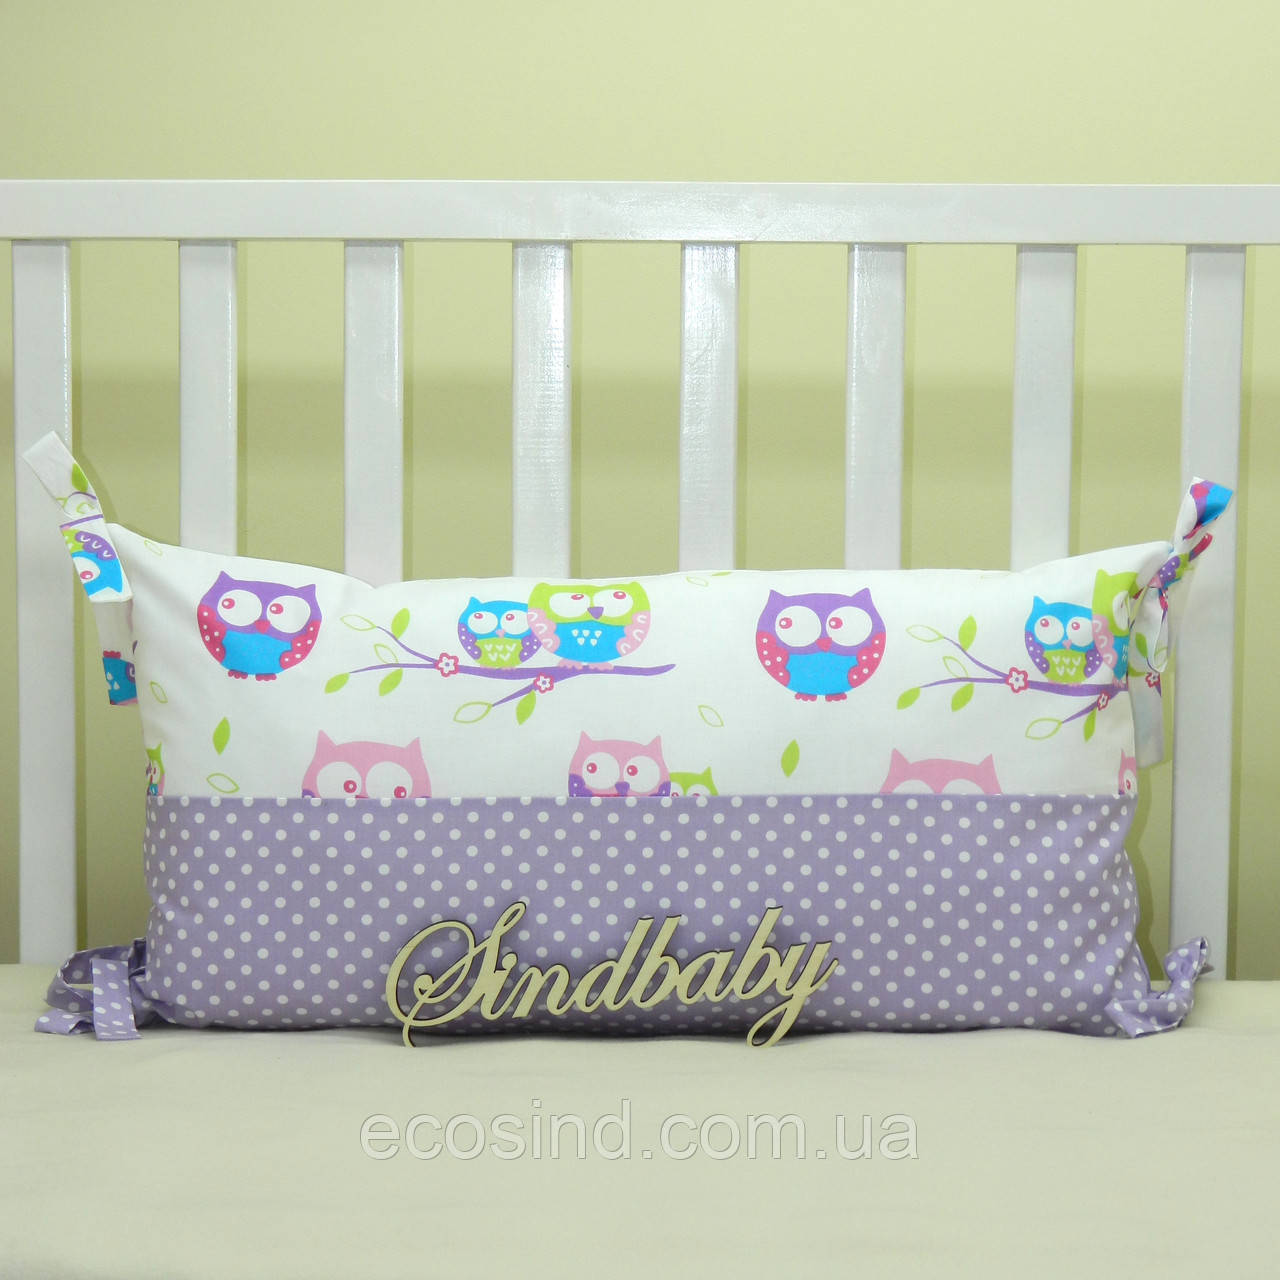 Бортики подушки в кроватку, Подушка - 01